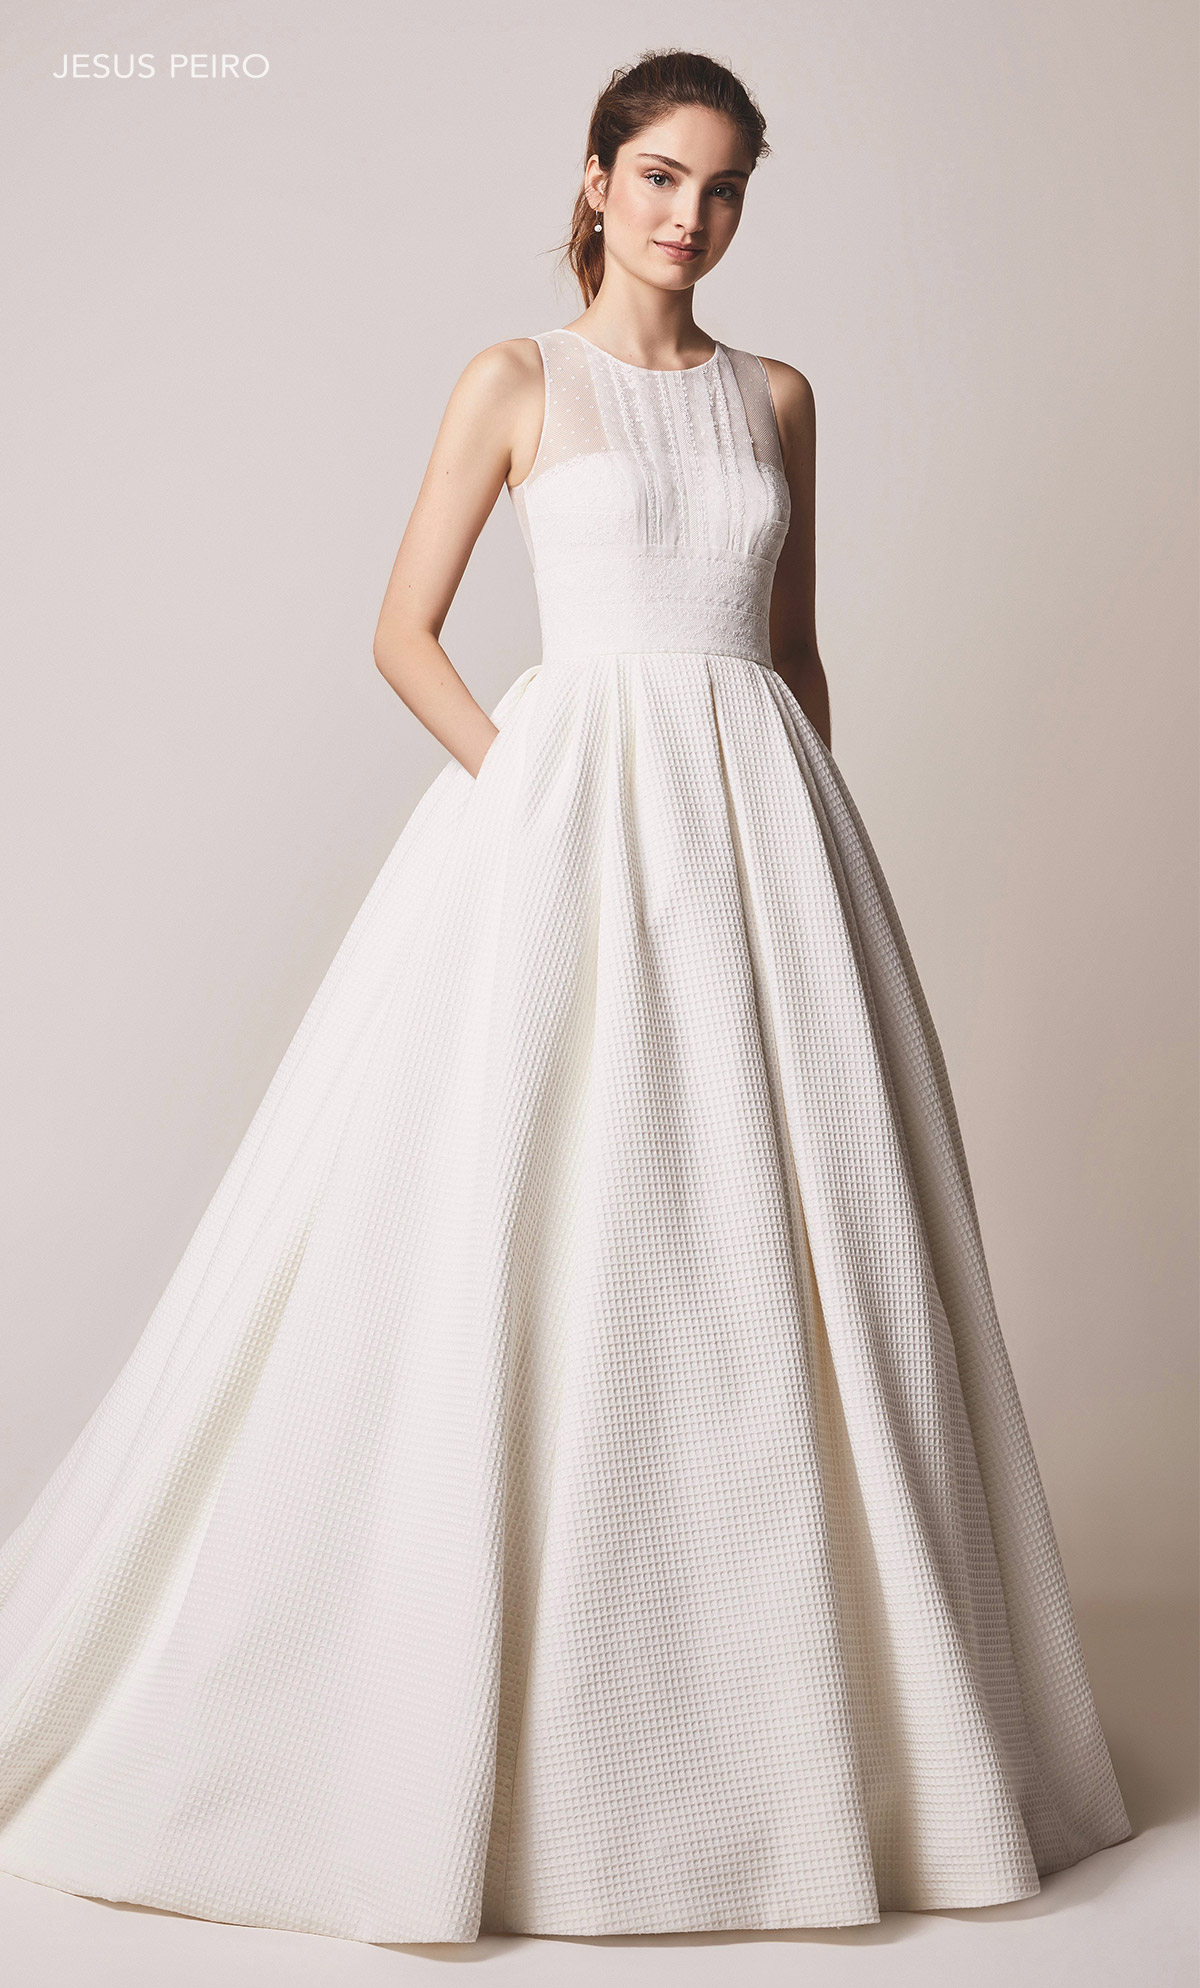 Vestido novia Jesús Peiró Ref.104